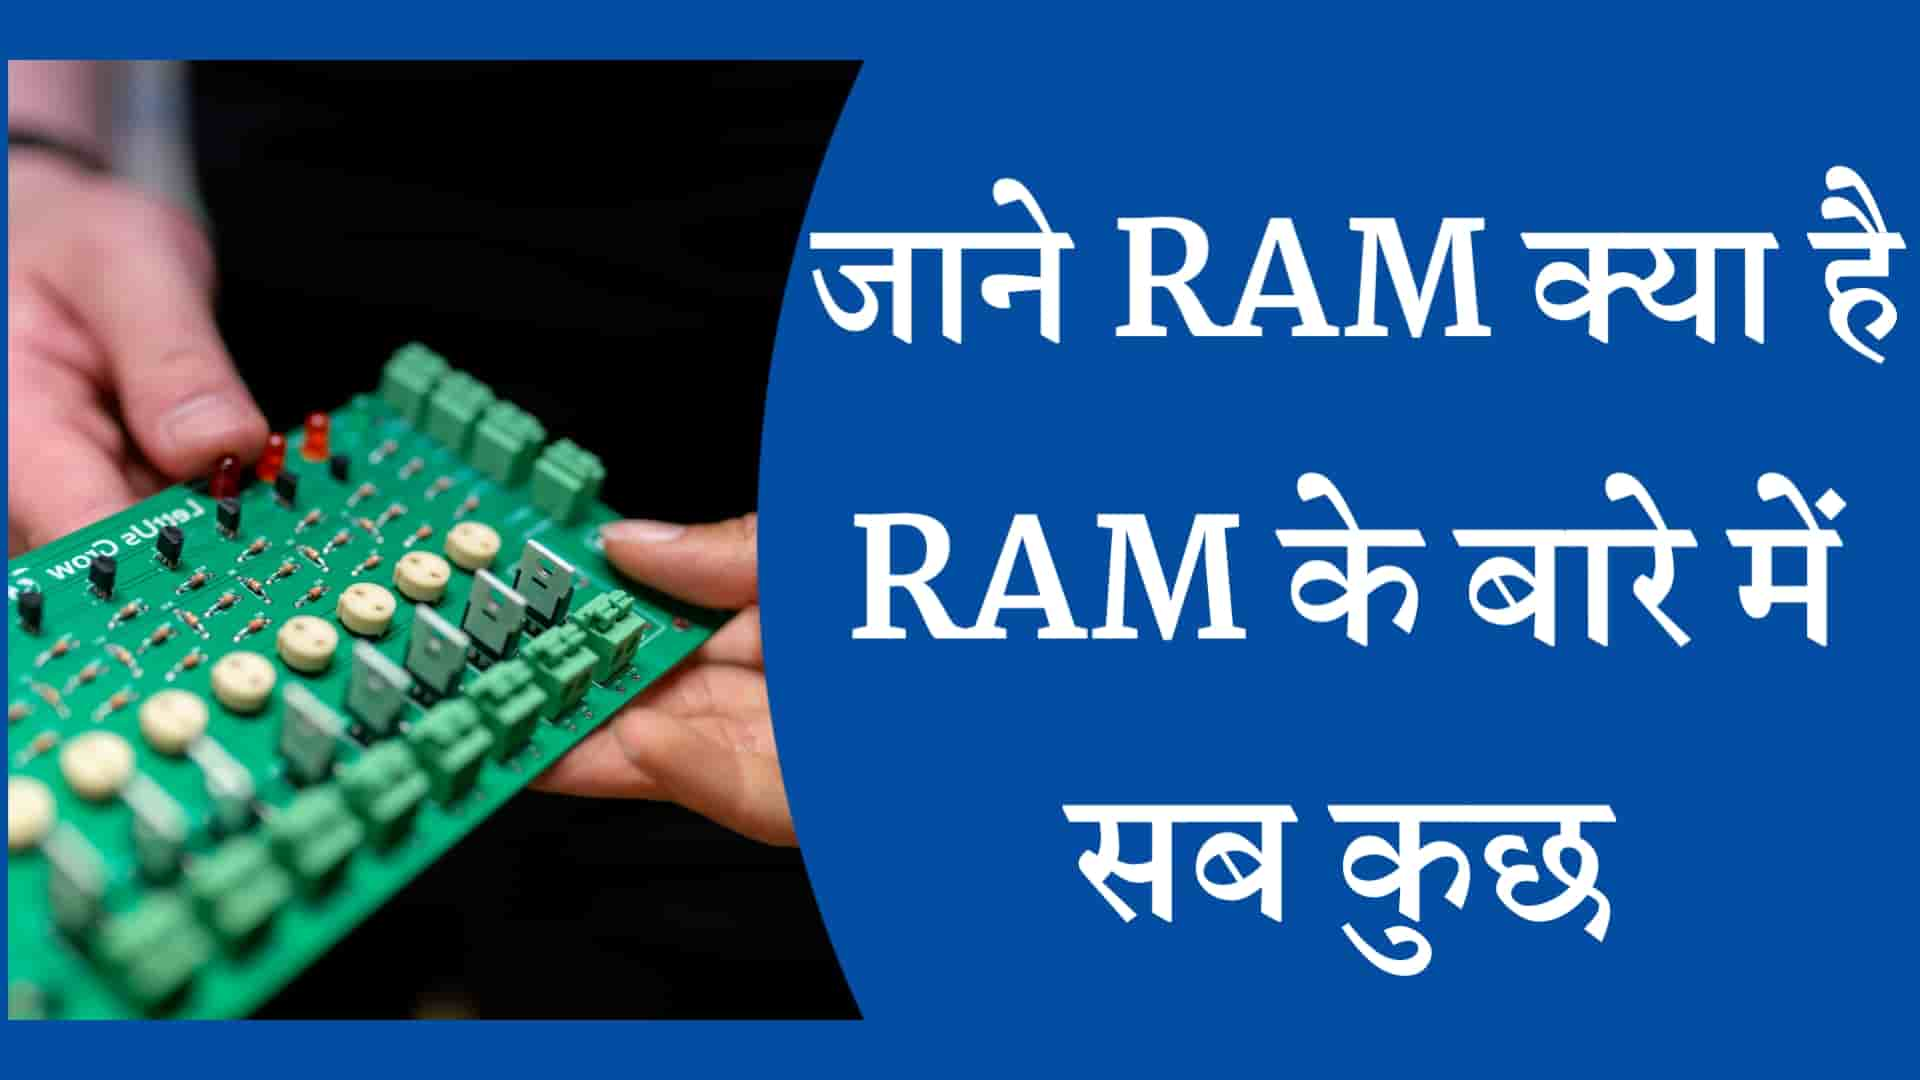 RAM Kya Hai Meaning of RAM in Hindi